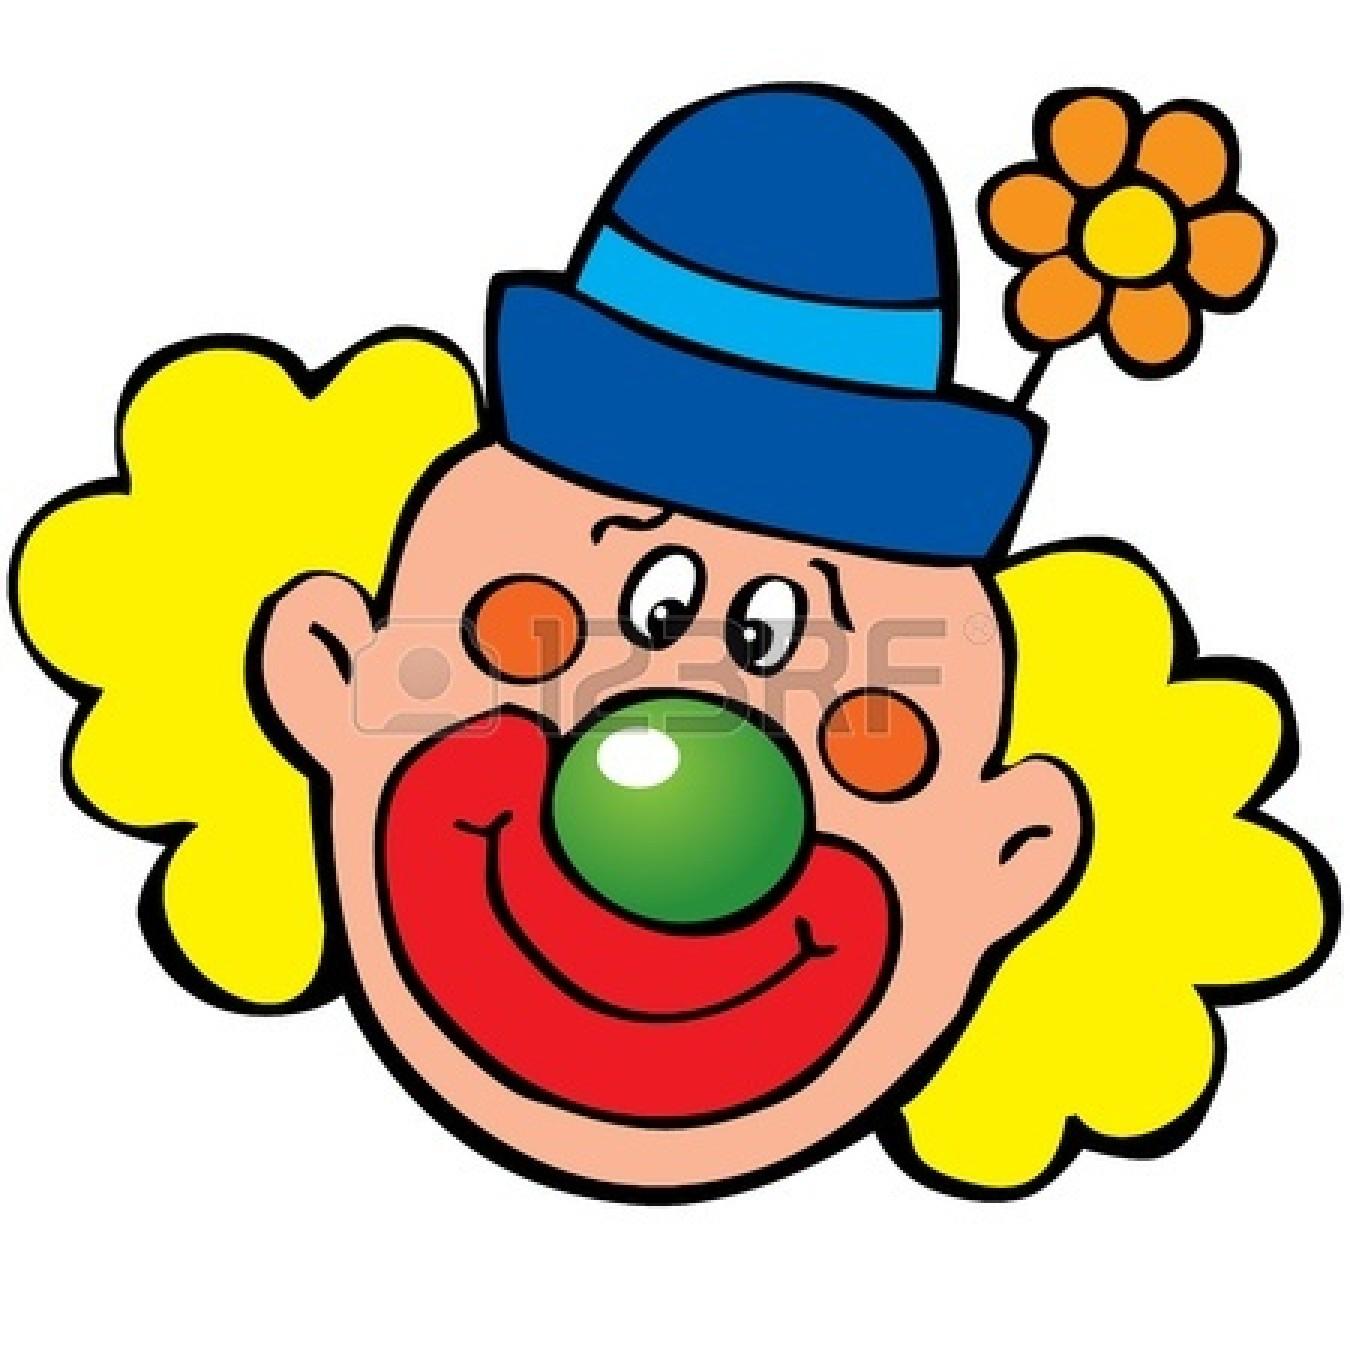 Carneval clipart happy Panda Free Clipart Clown Clipart